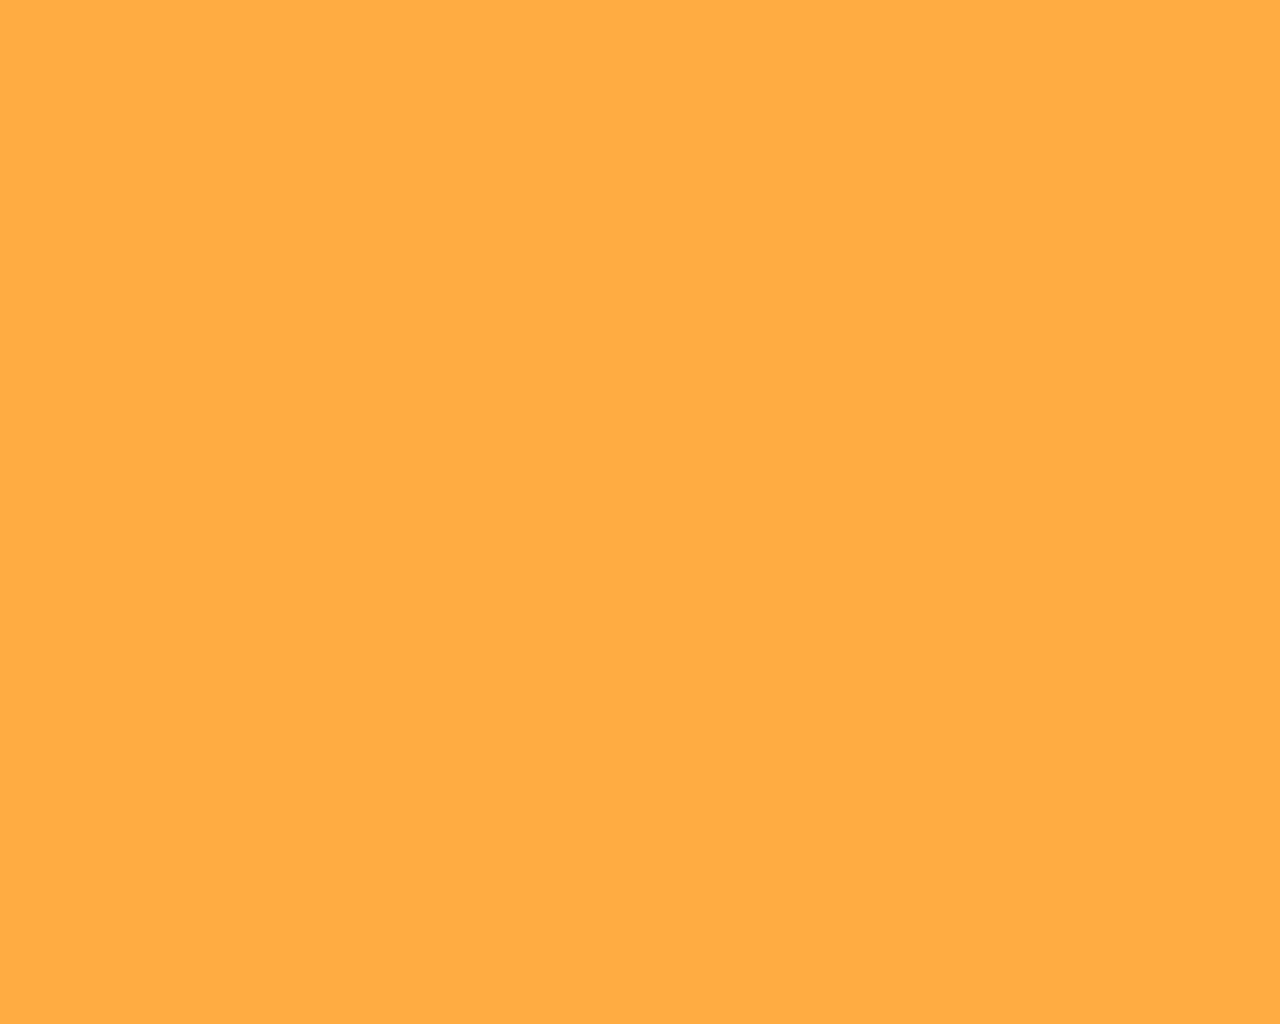 Solid Orange Background 1280x1024 yellow orange solid 1280x1024